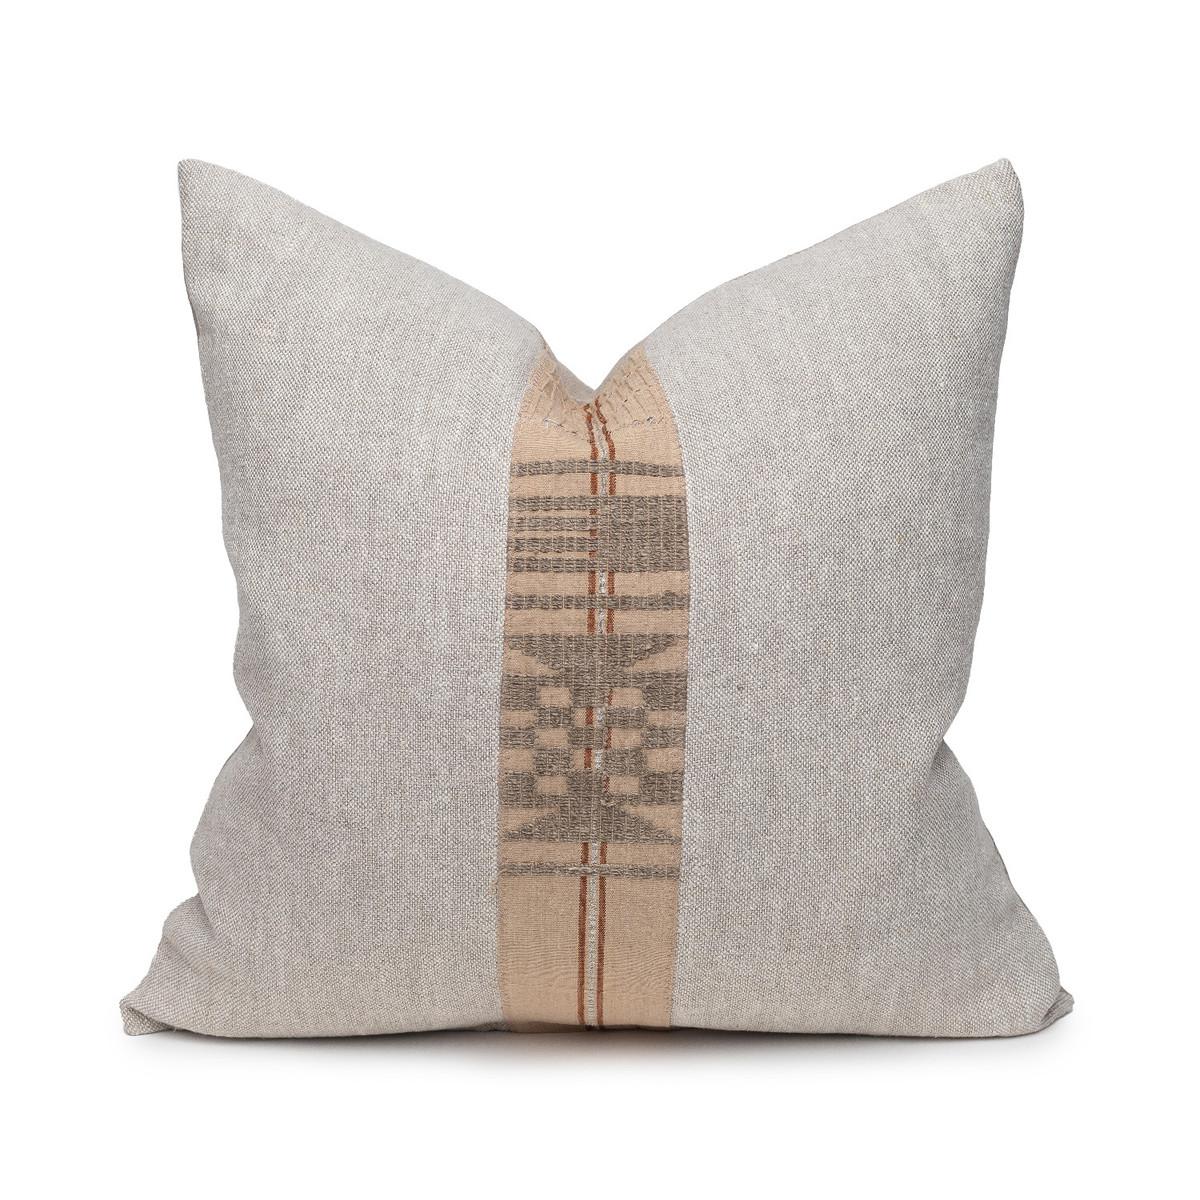 Daku Natural Linen and Aso Oke Pillow - 20- Front View